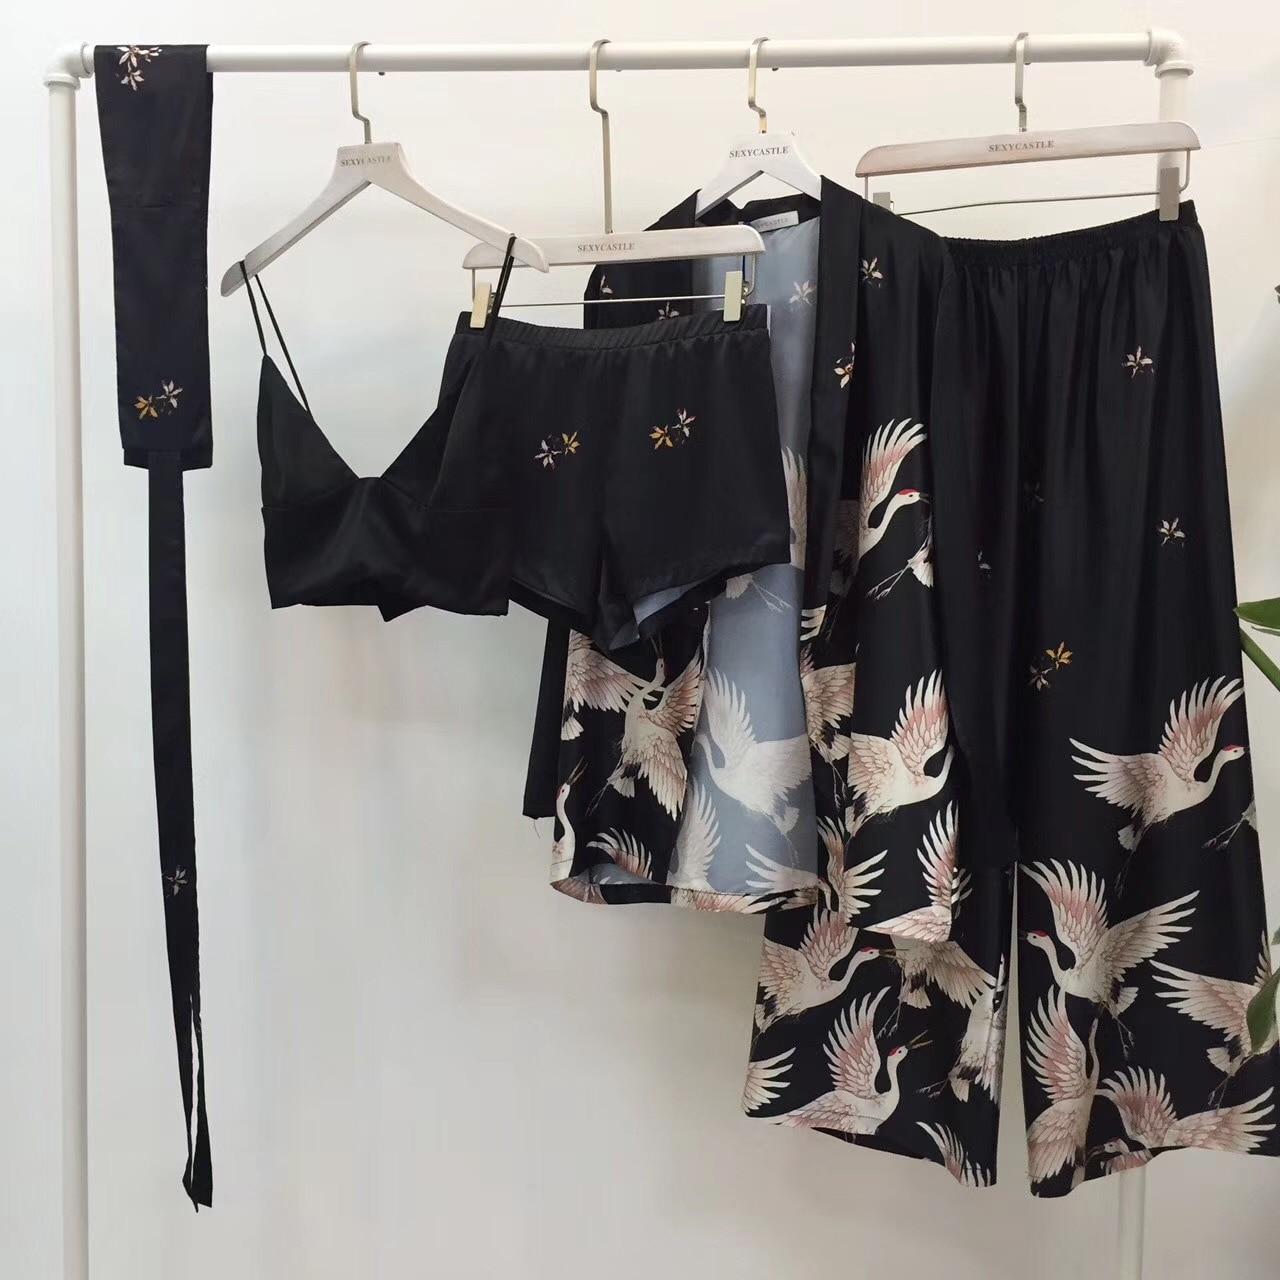 2018 New Fashion Brand Spring Autumn Women's Satin Silk Pajamas Cranes Print Five Piece Pants Set Home Clothing Casual Nightwear